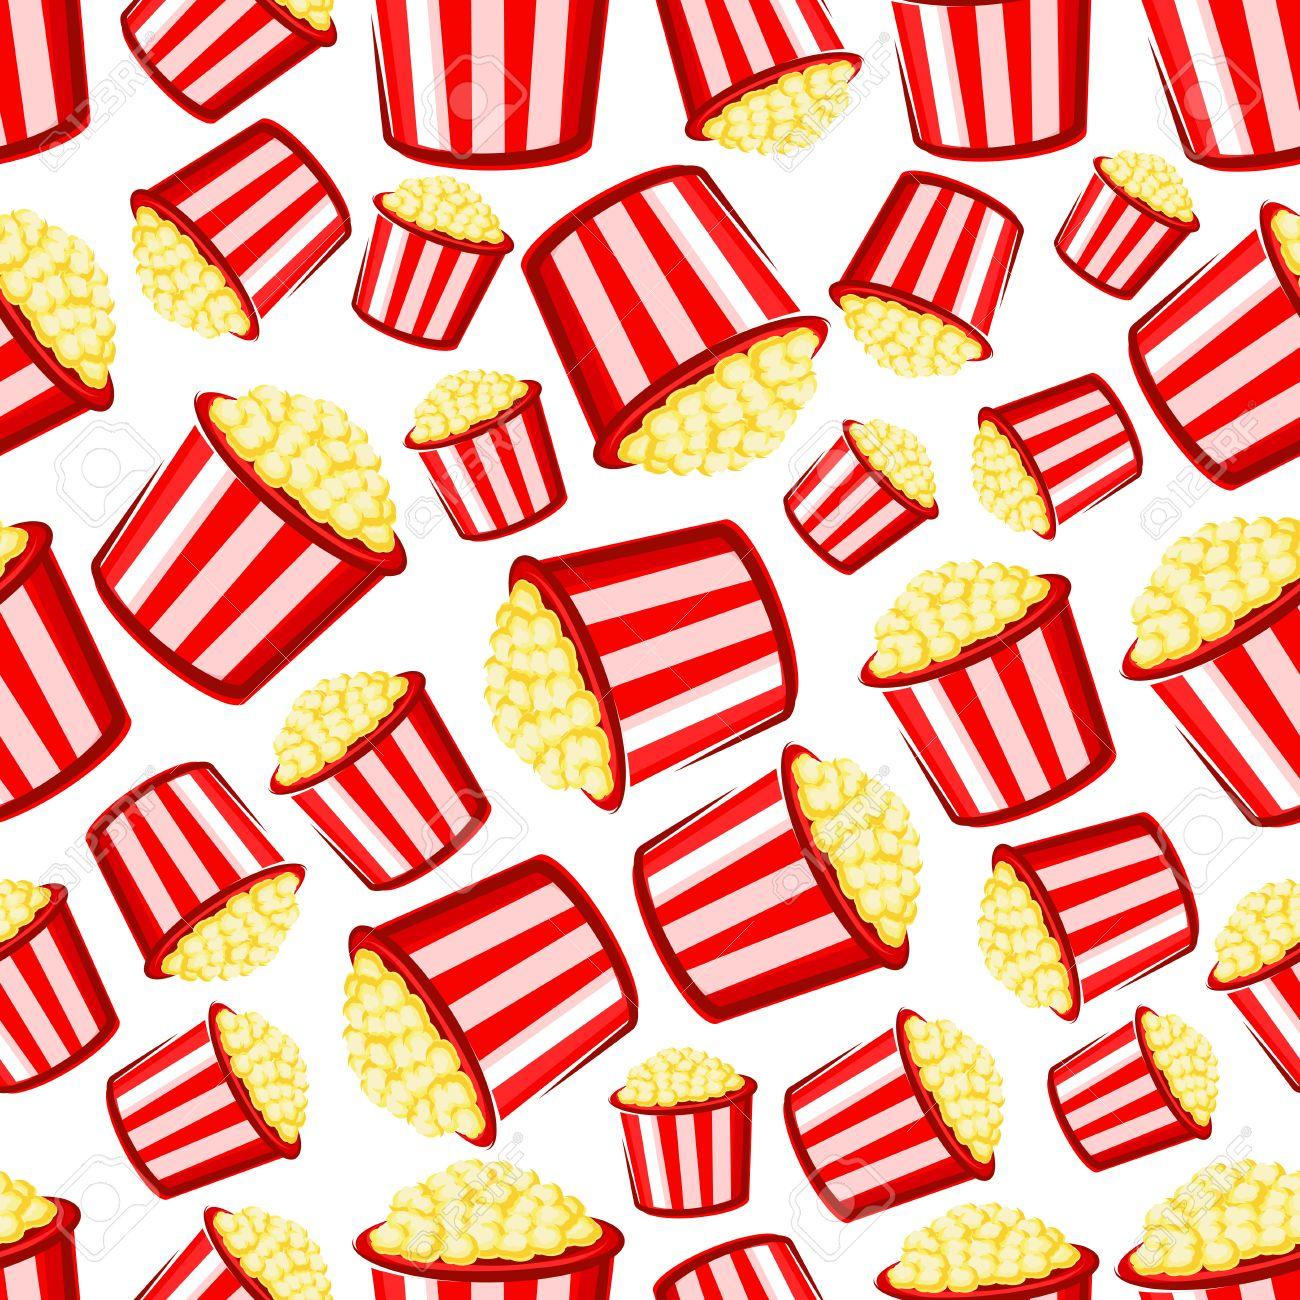 Takeaway Popcorn Background With Cartoon Seamless Pattern Of 1300x1300